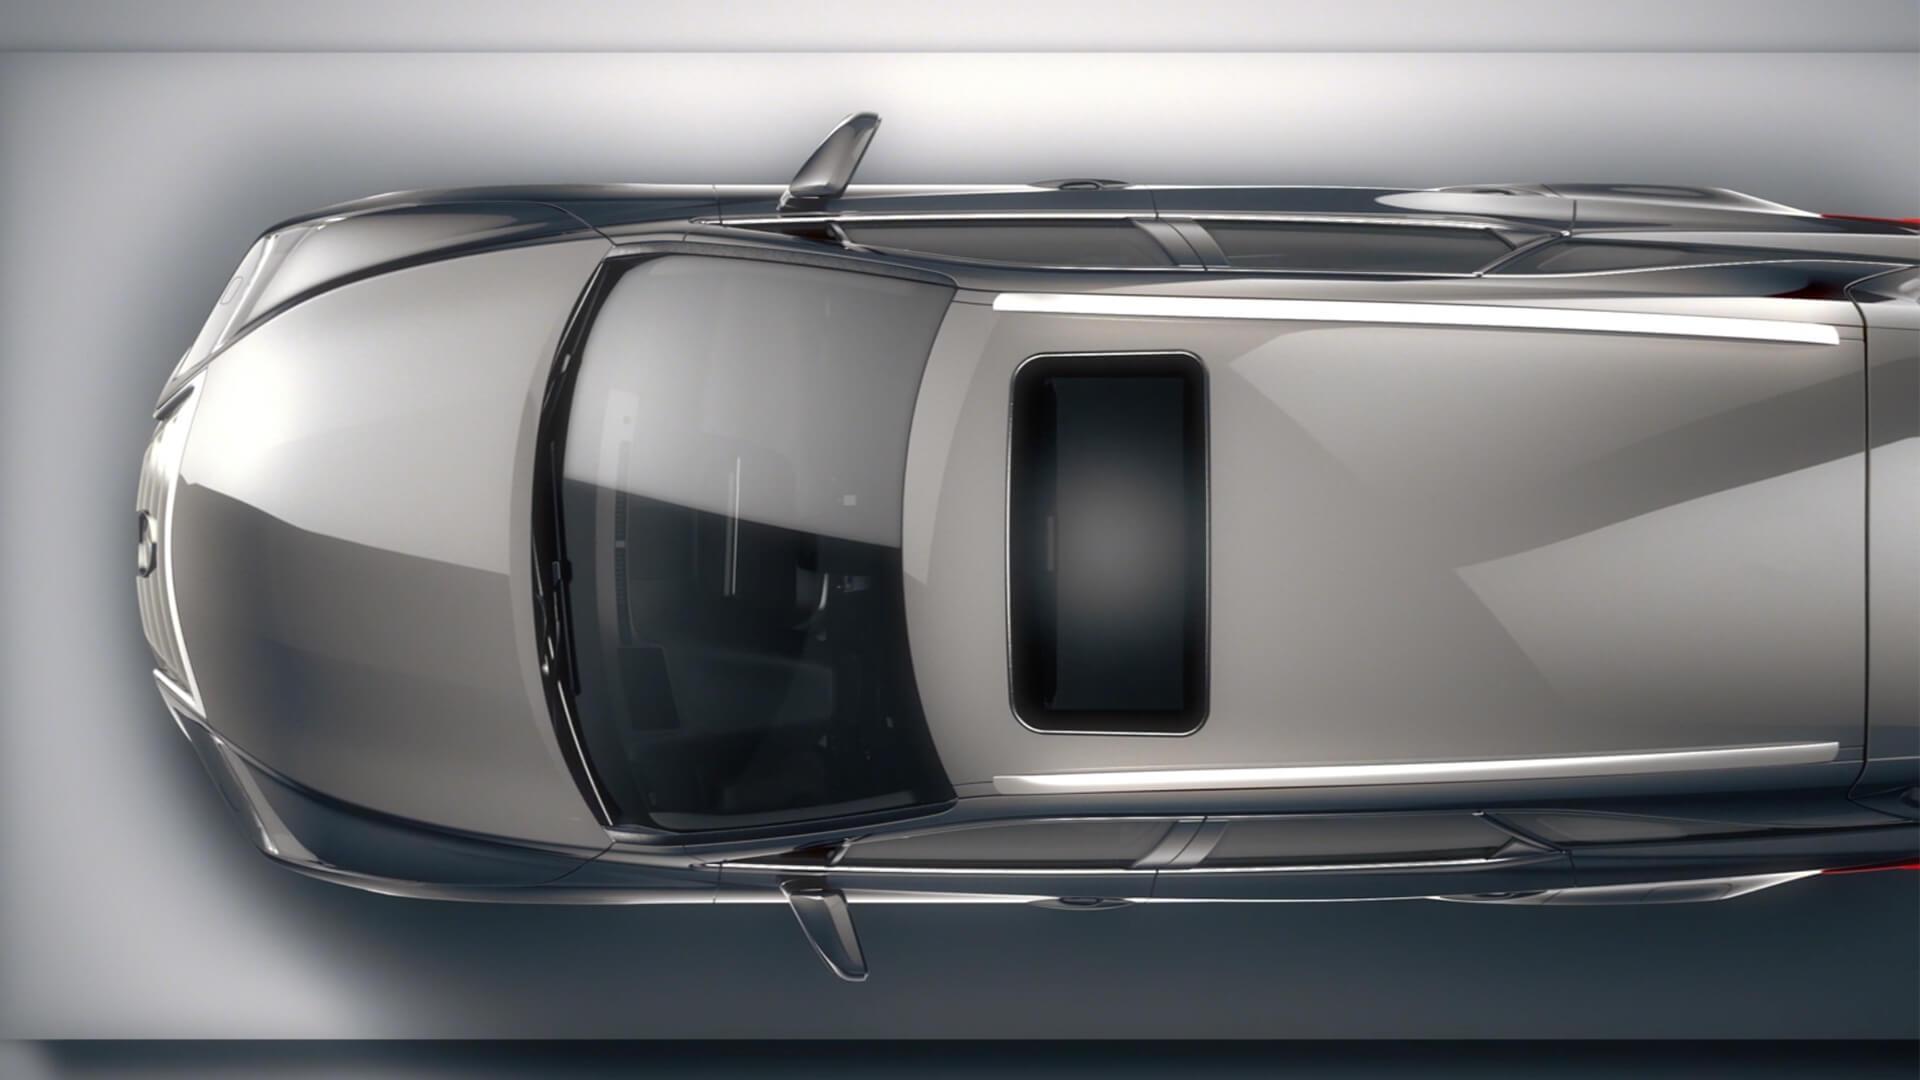 2018 lexus rx l features floating roof design